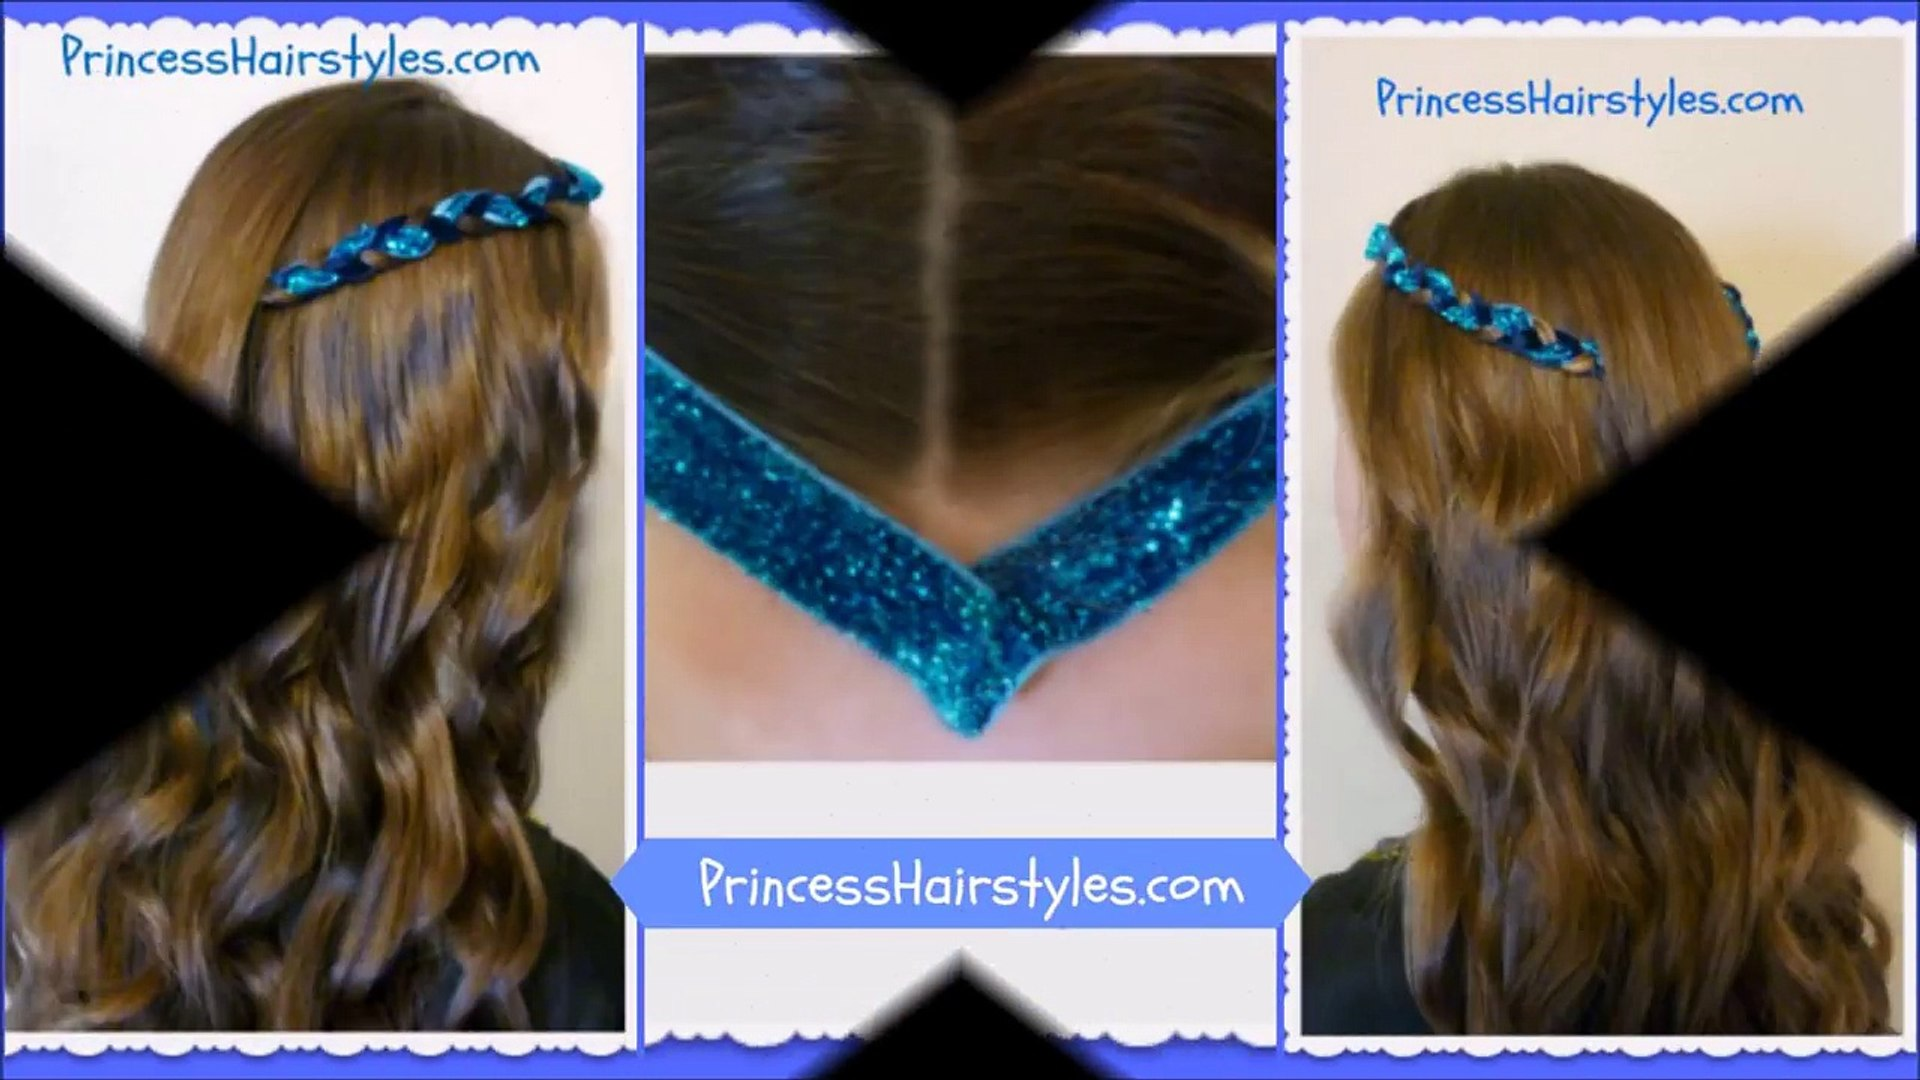 Disney Descendants Hairstyle, Evie or Sofia Carson Inspired